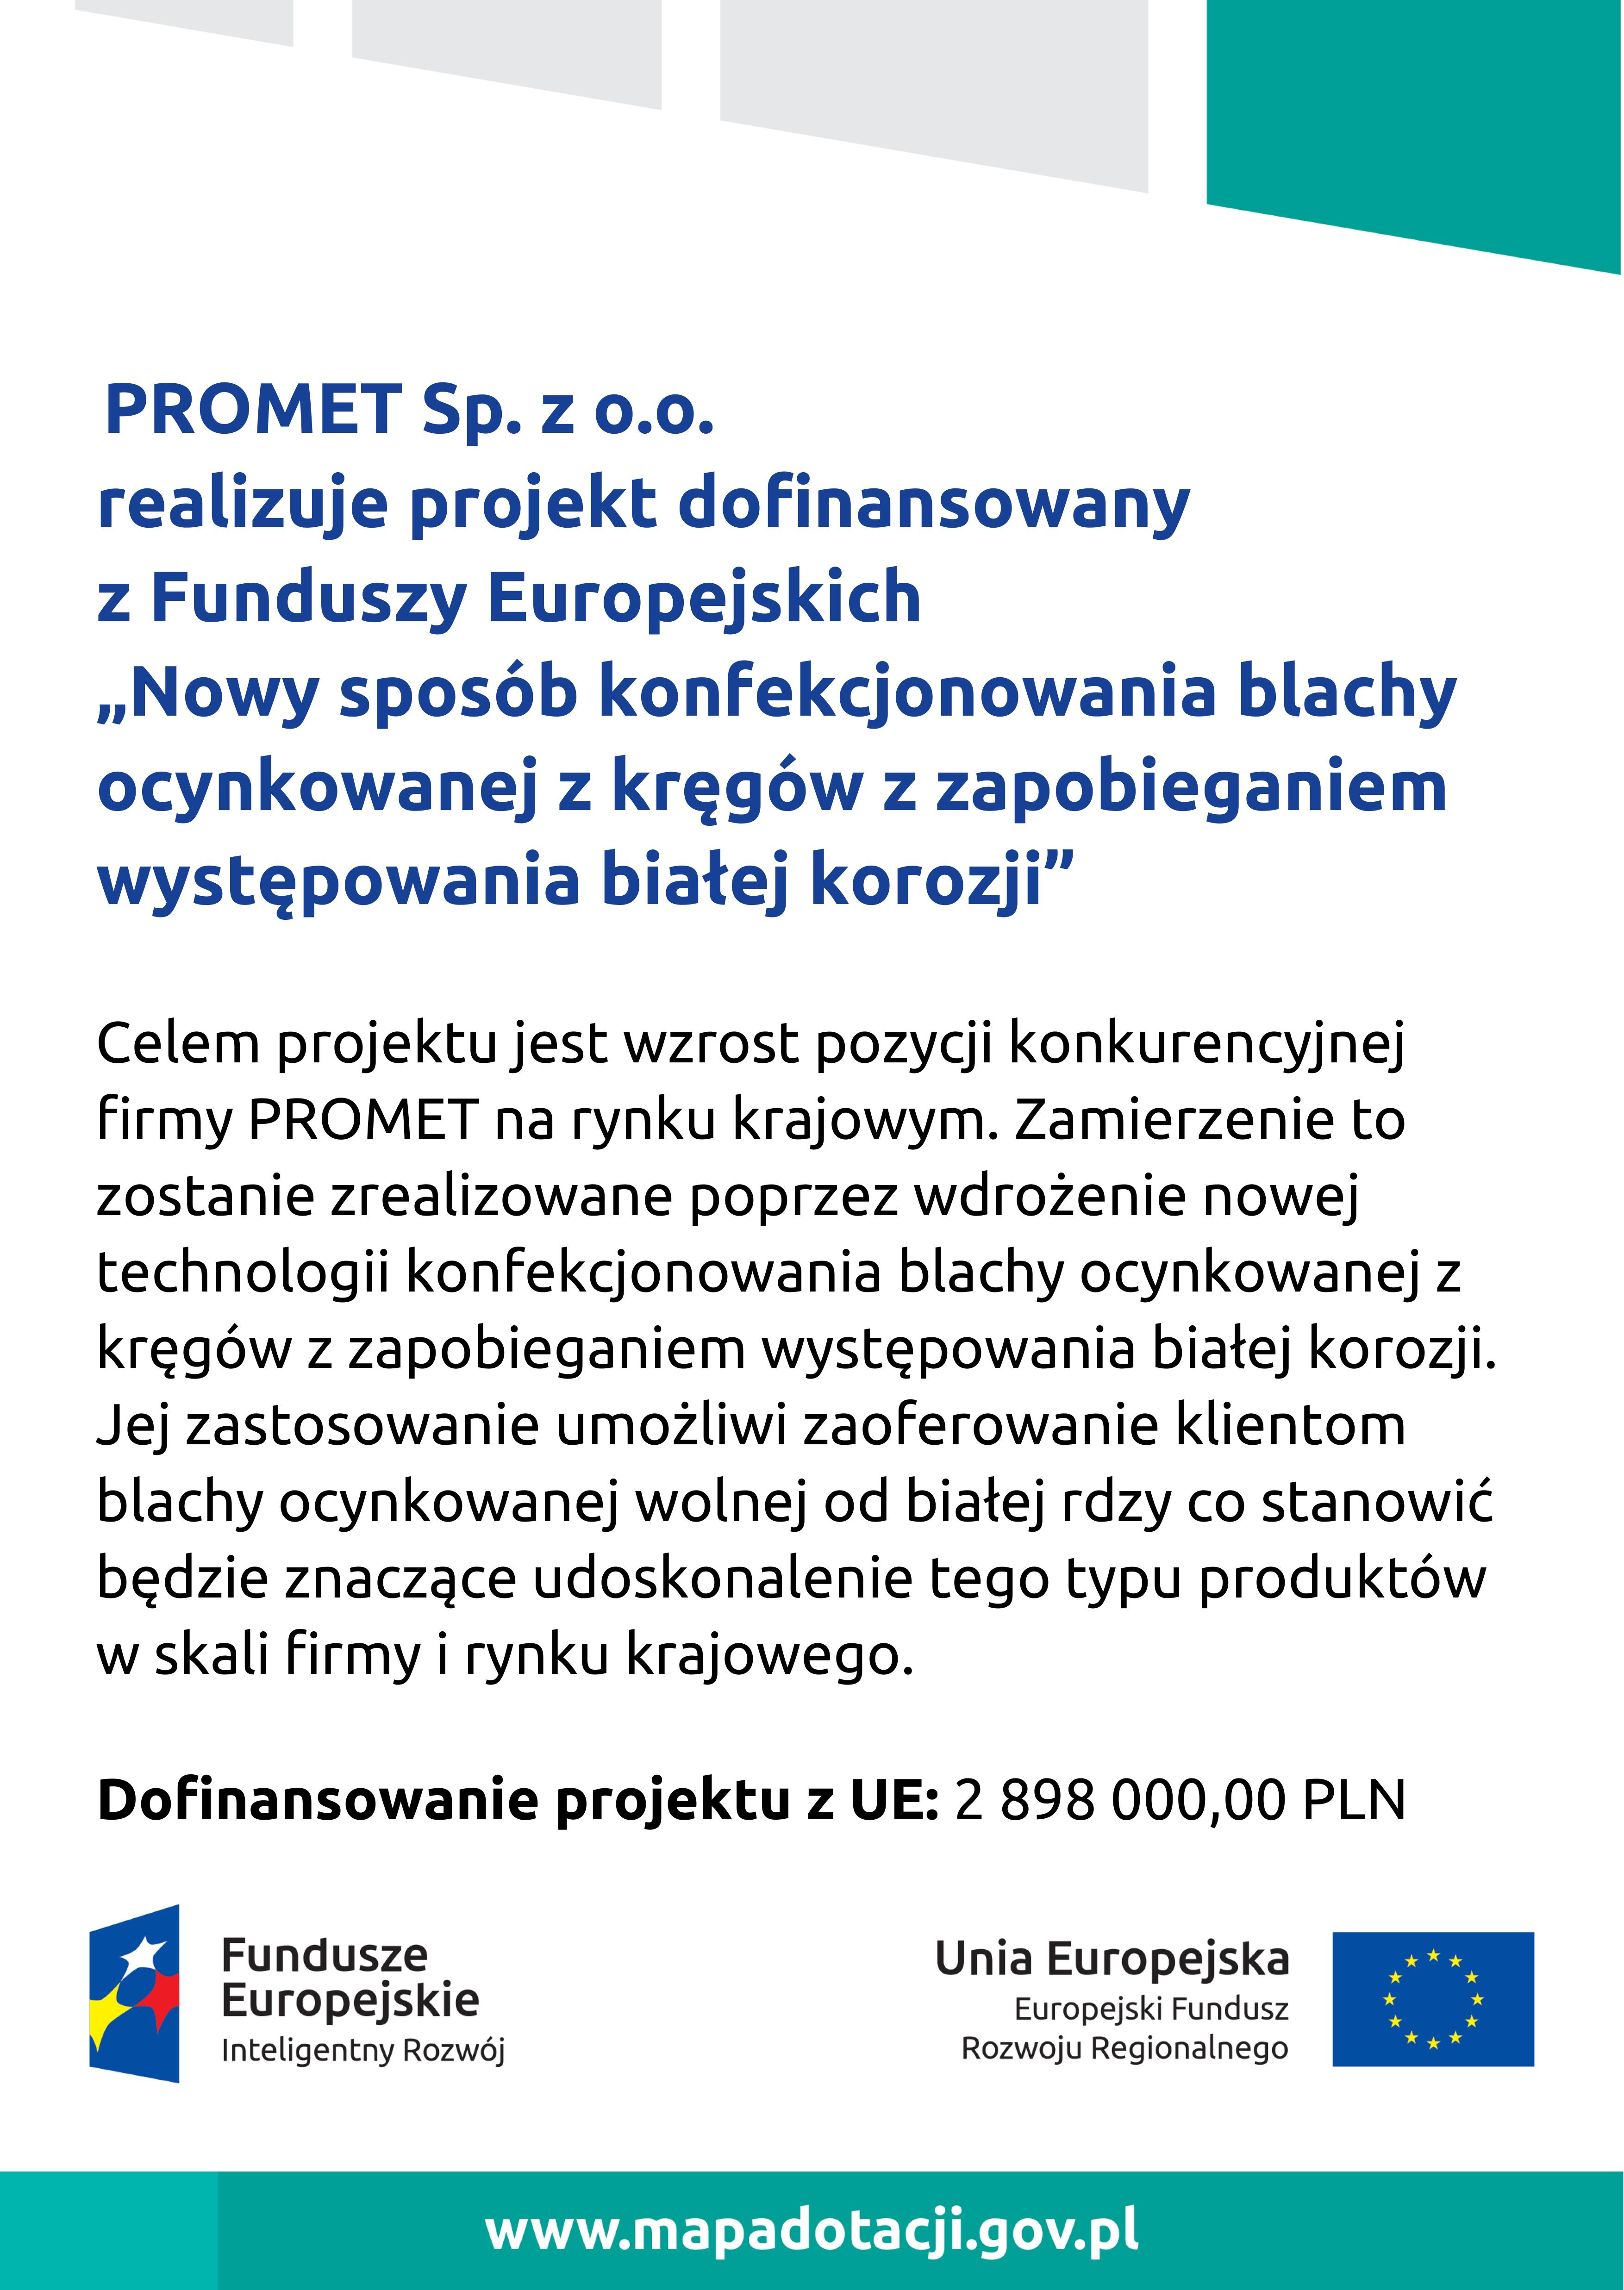 FEIR_pion_edytowalny - png